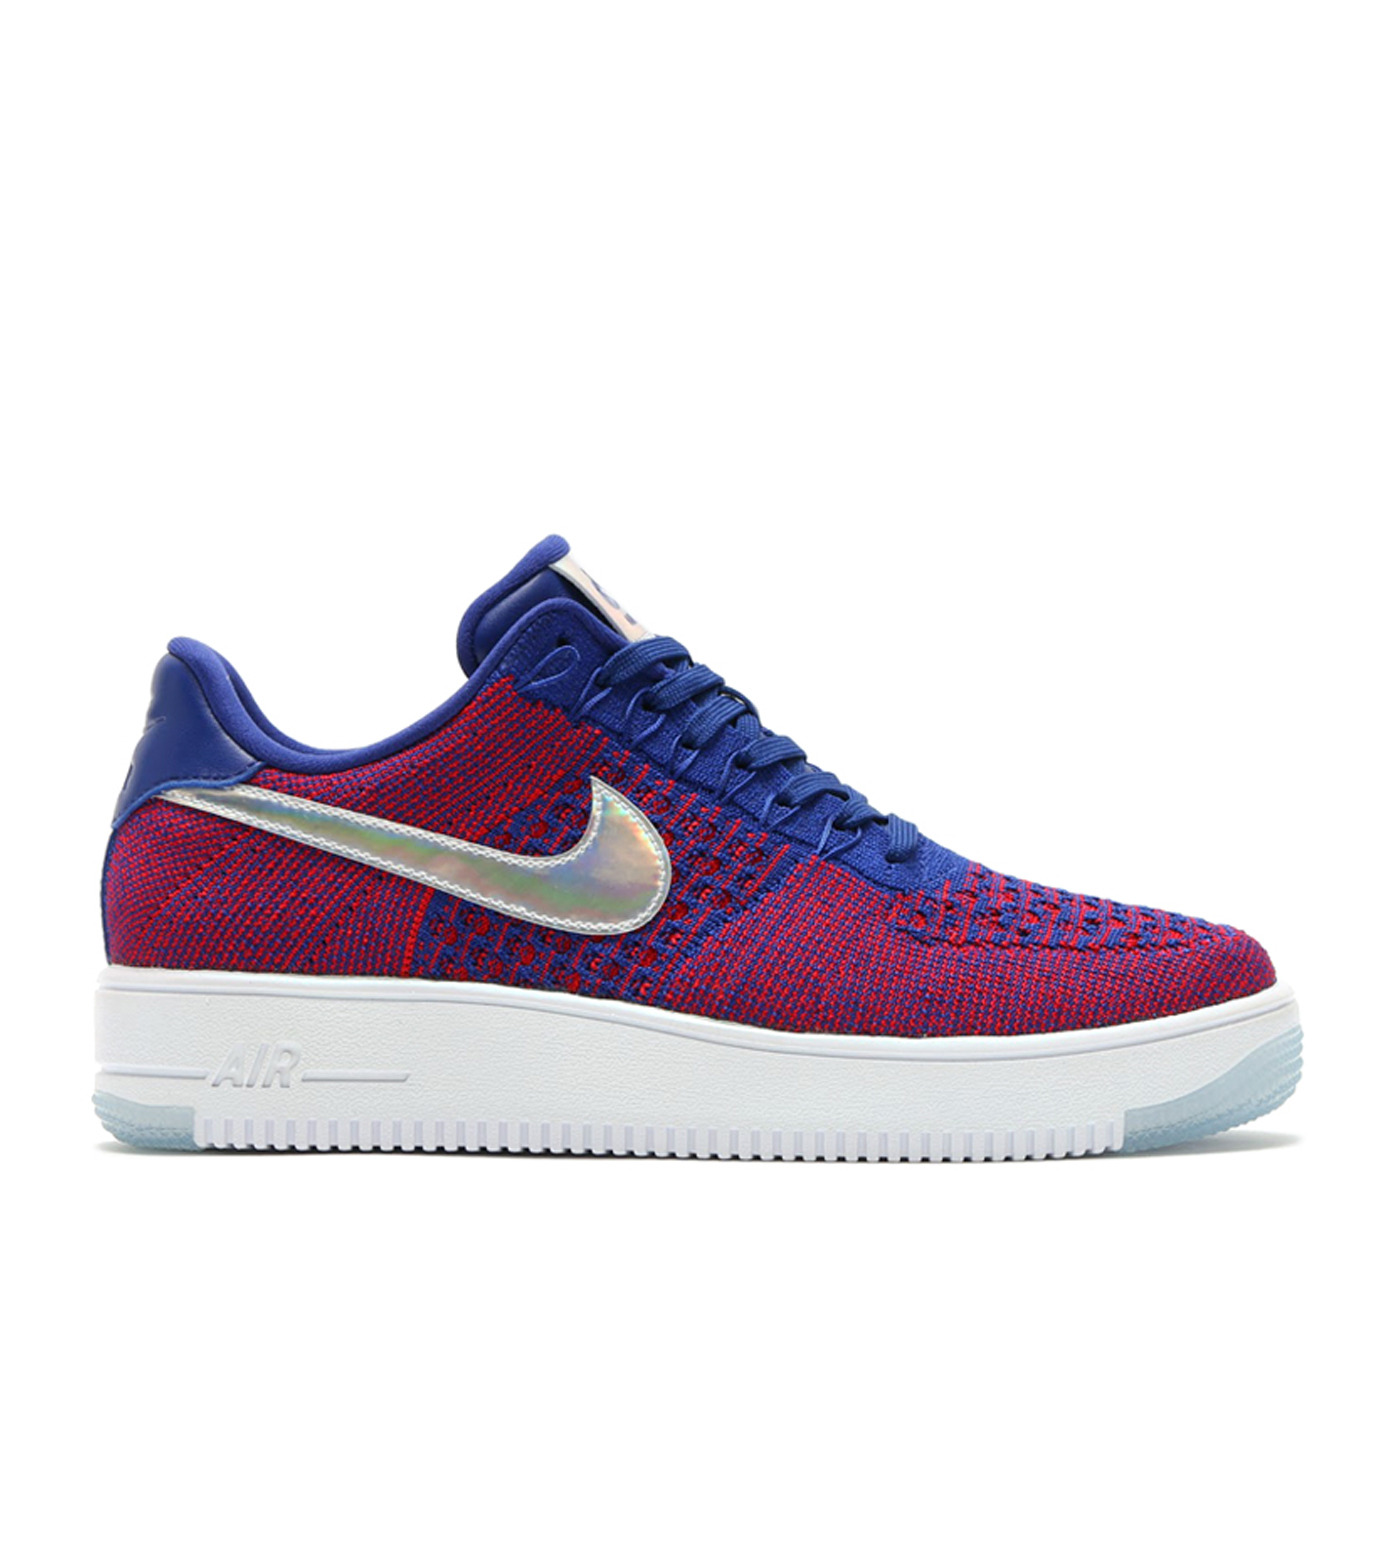 NIKE(ナイキ)のAF1 ULTRA FLYKNIT LOW PRM-BLUE(シューズ/shoes)-826577-601-92 拡大詳細画像1